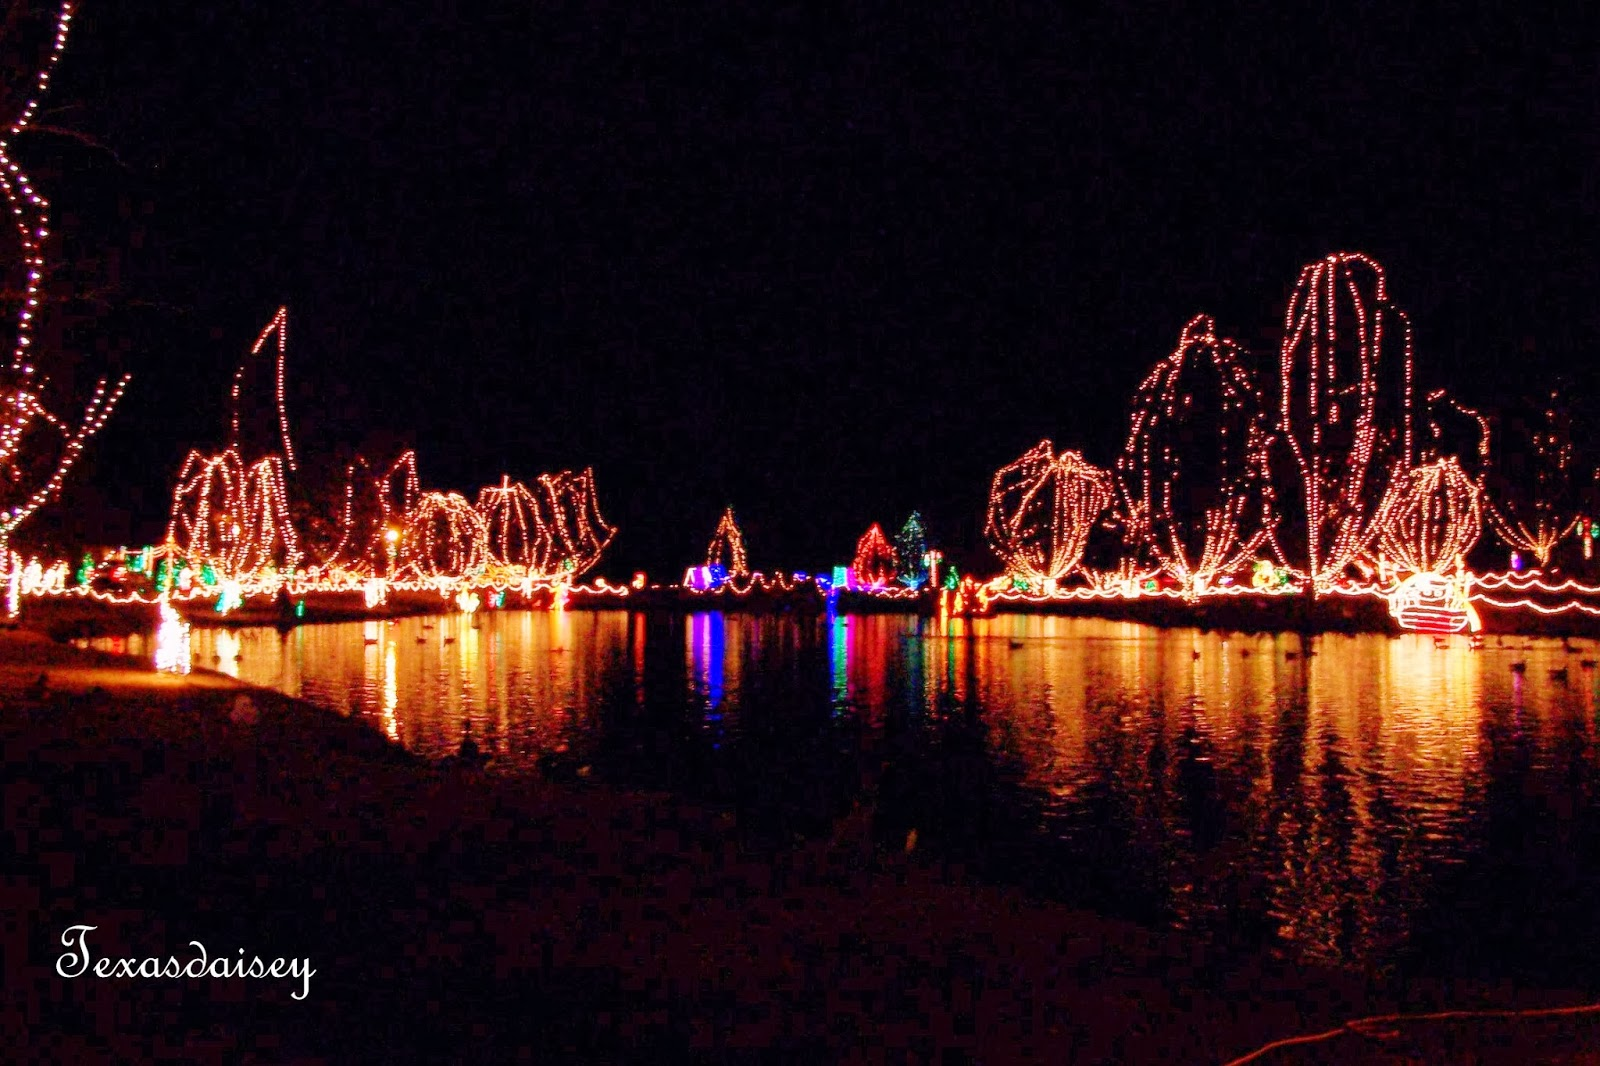 chickasha ok festival of light - Chickasha Christmas Lights